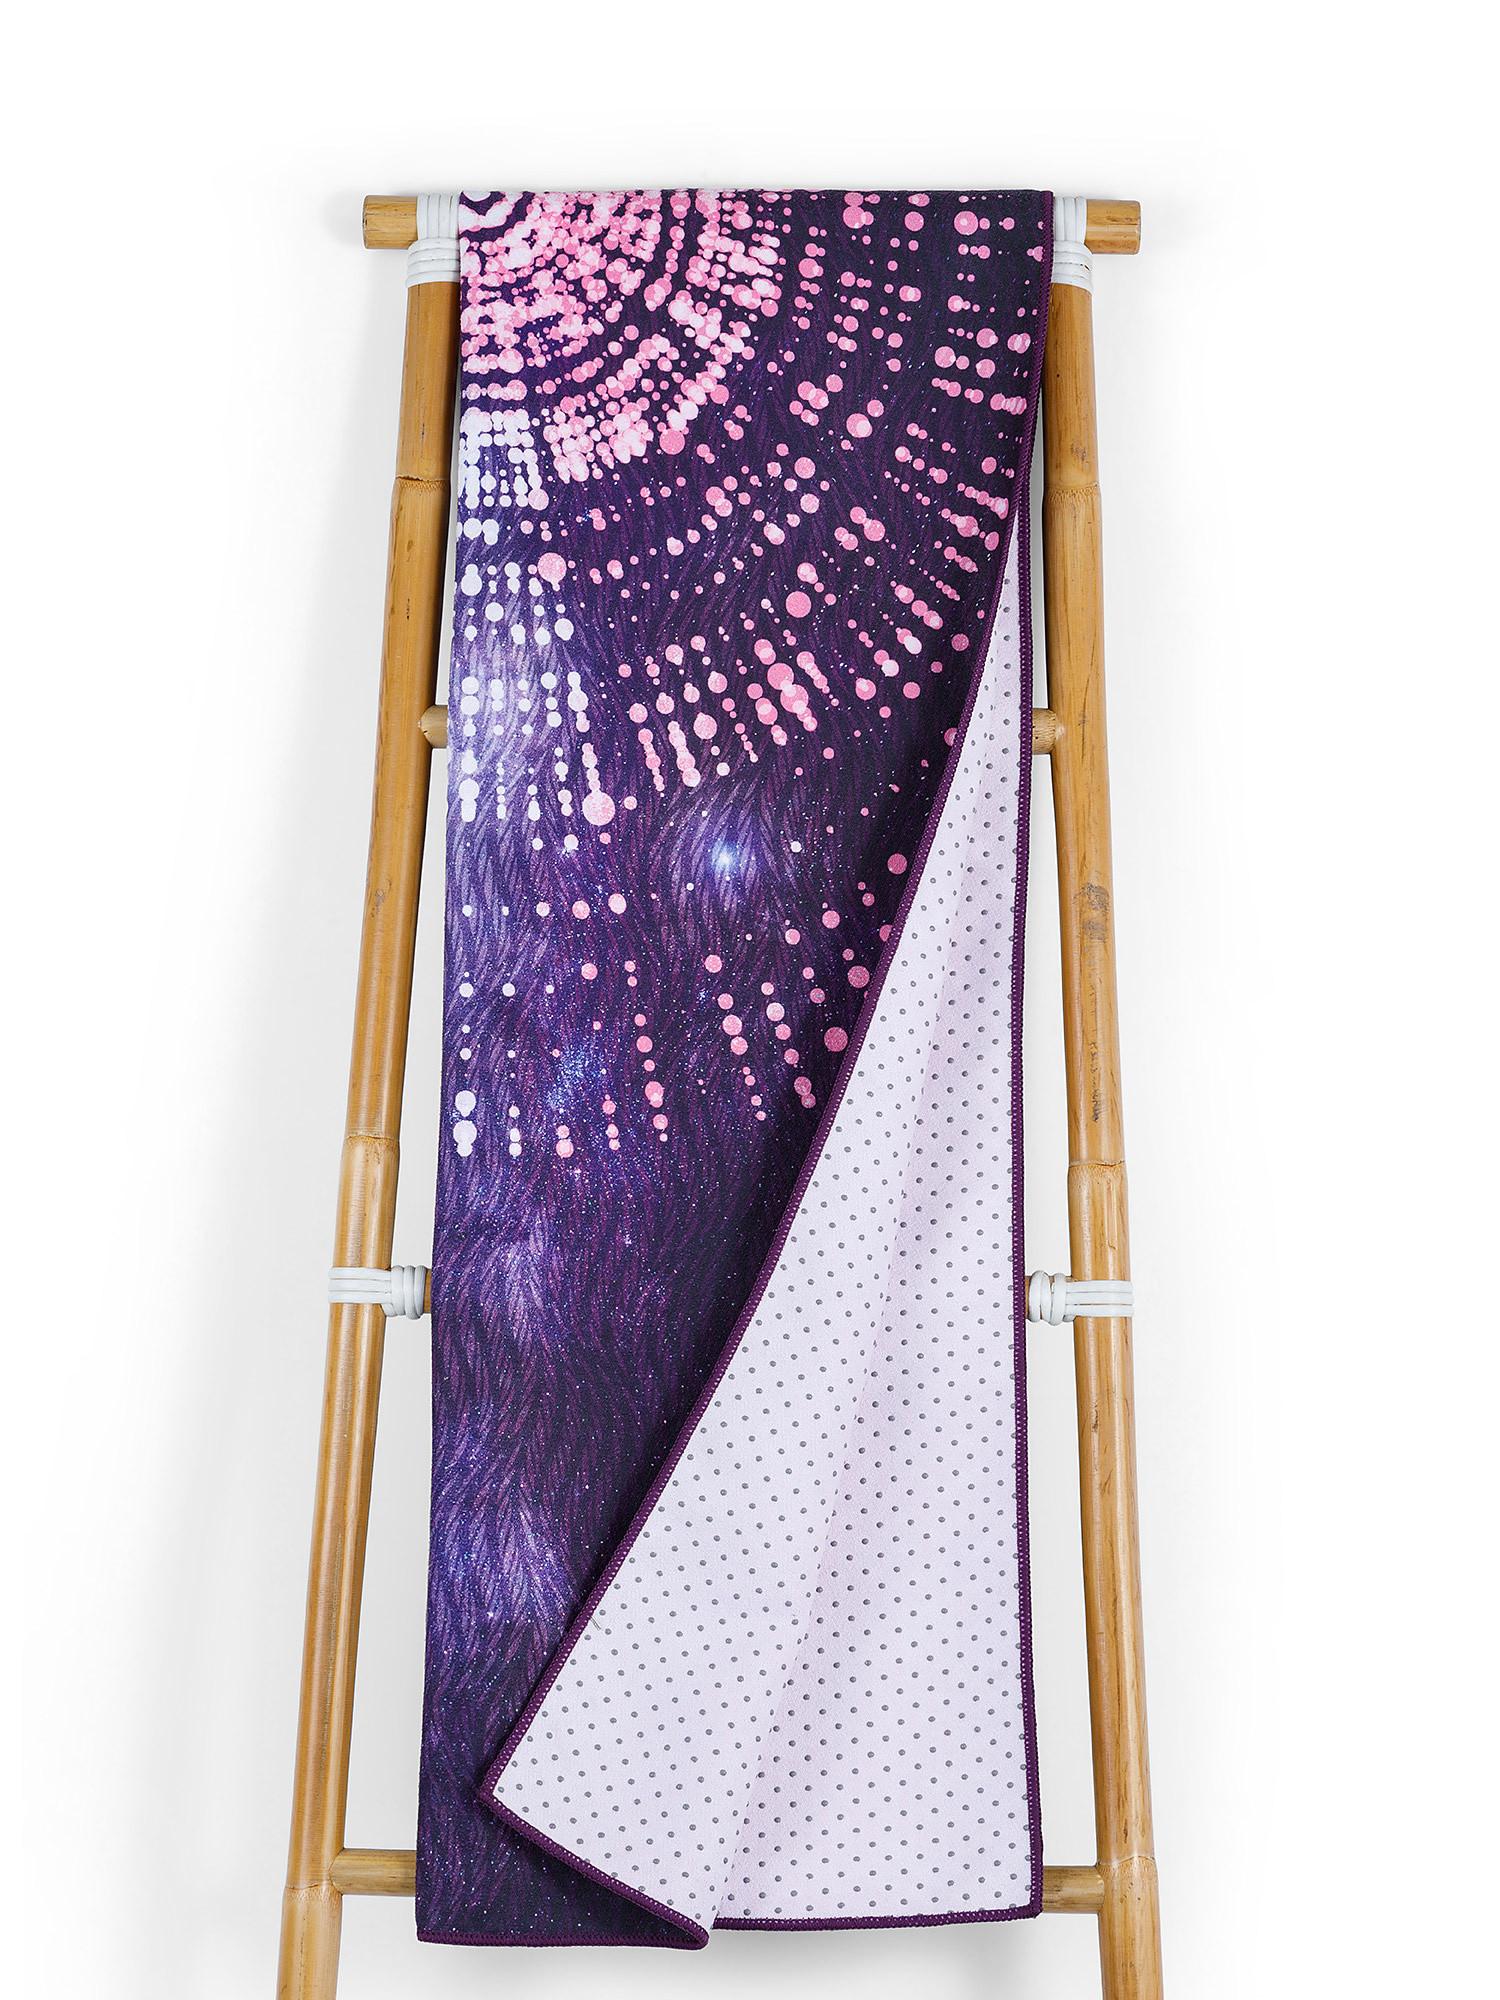 Telo yoga in microfibra stampa universo, Multicolor, large image number 0